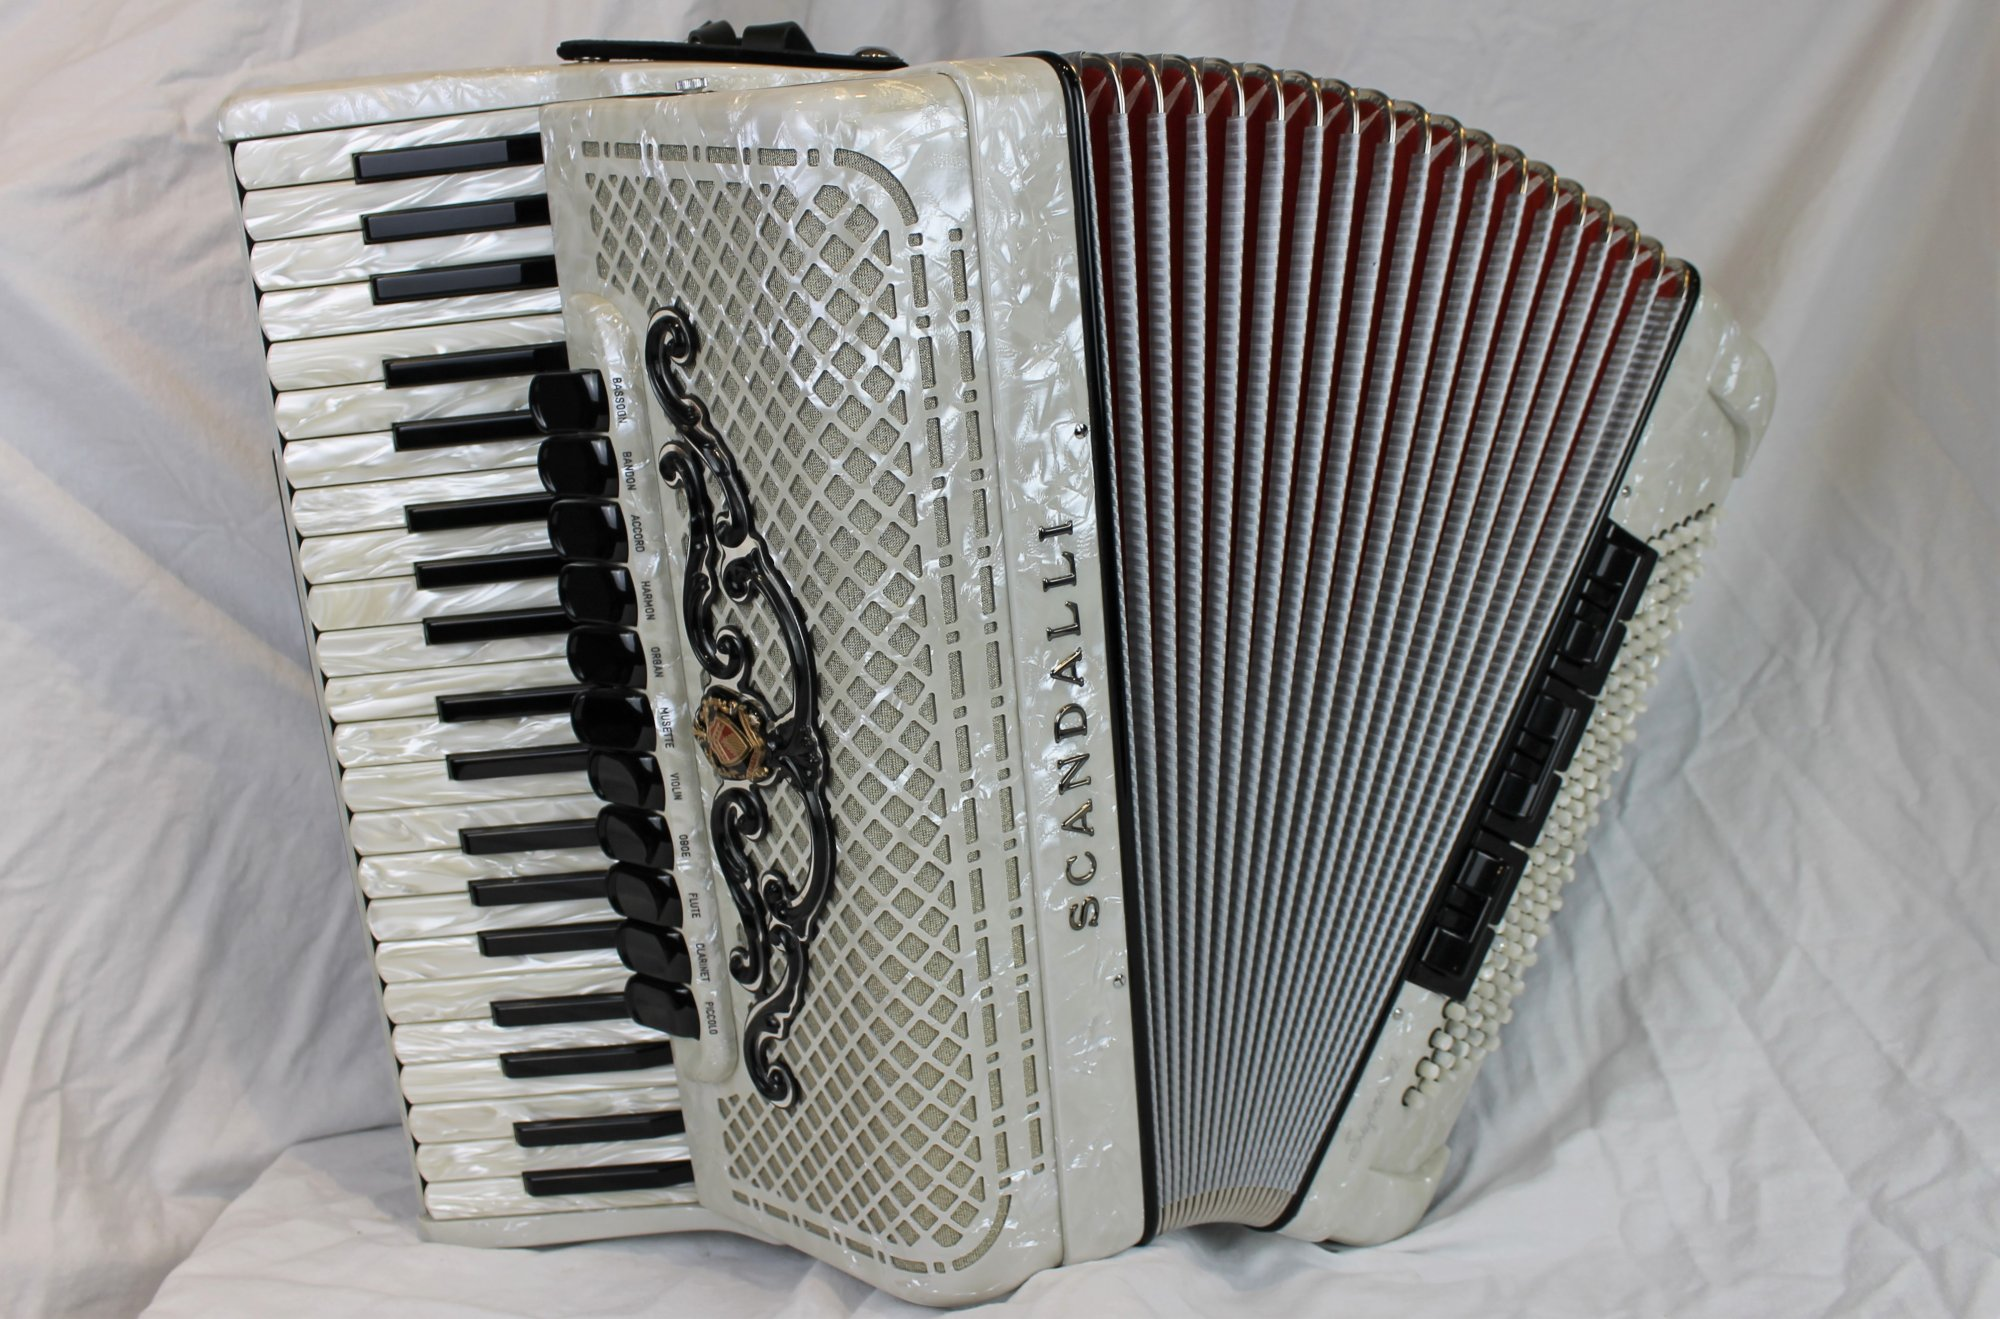 NEW White Scandalli Super VI Piano Accordion LMMH 41 120